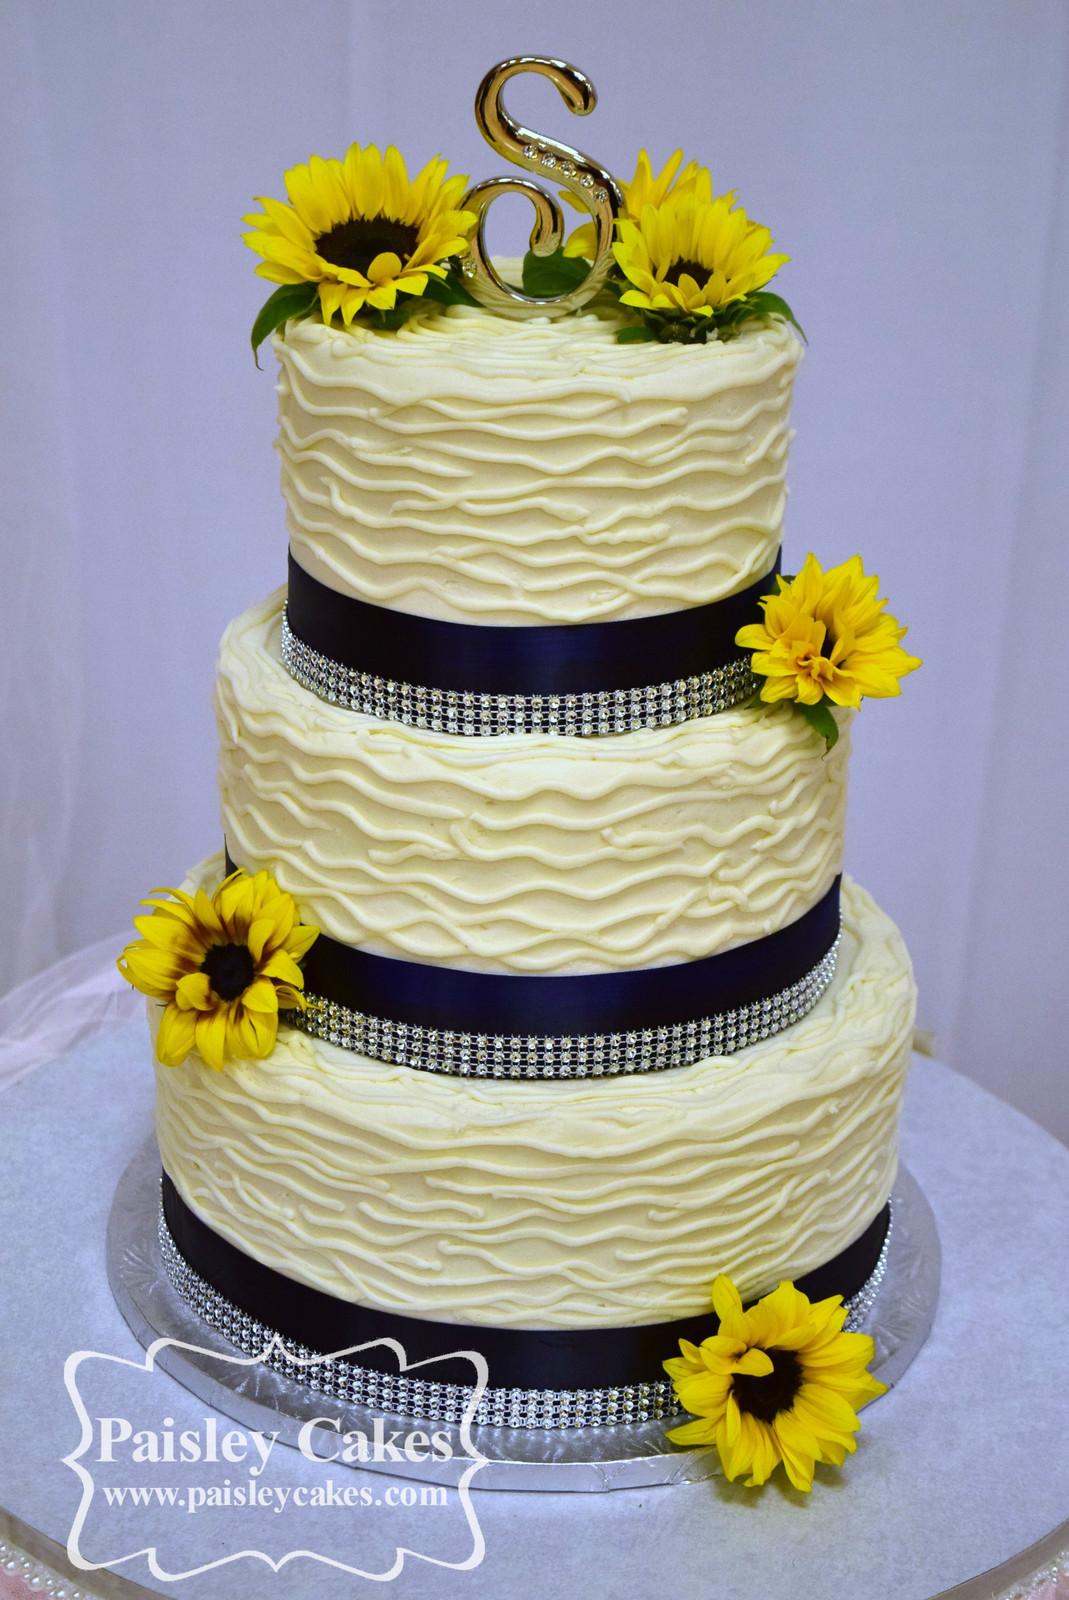 Wedding Cakes, Paisley Cakes, Blackfoot Idaho, Wedding desserts